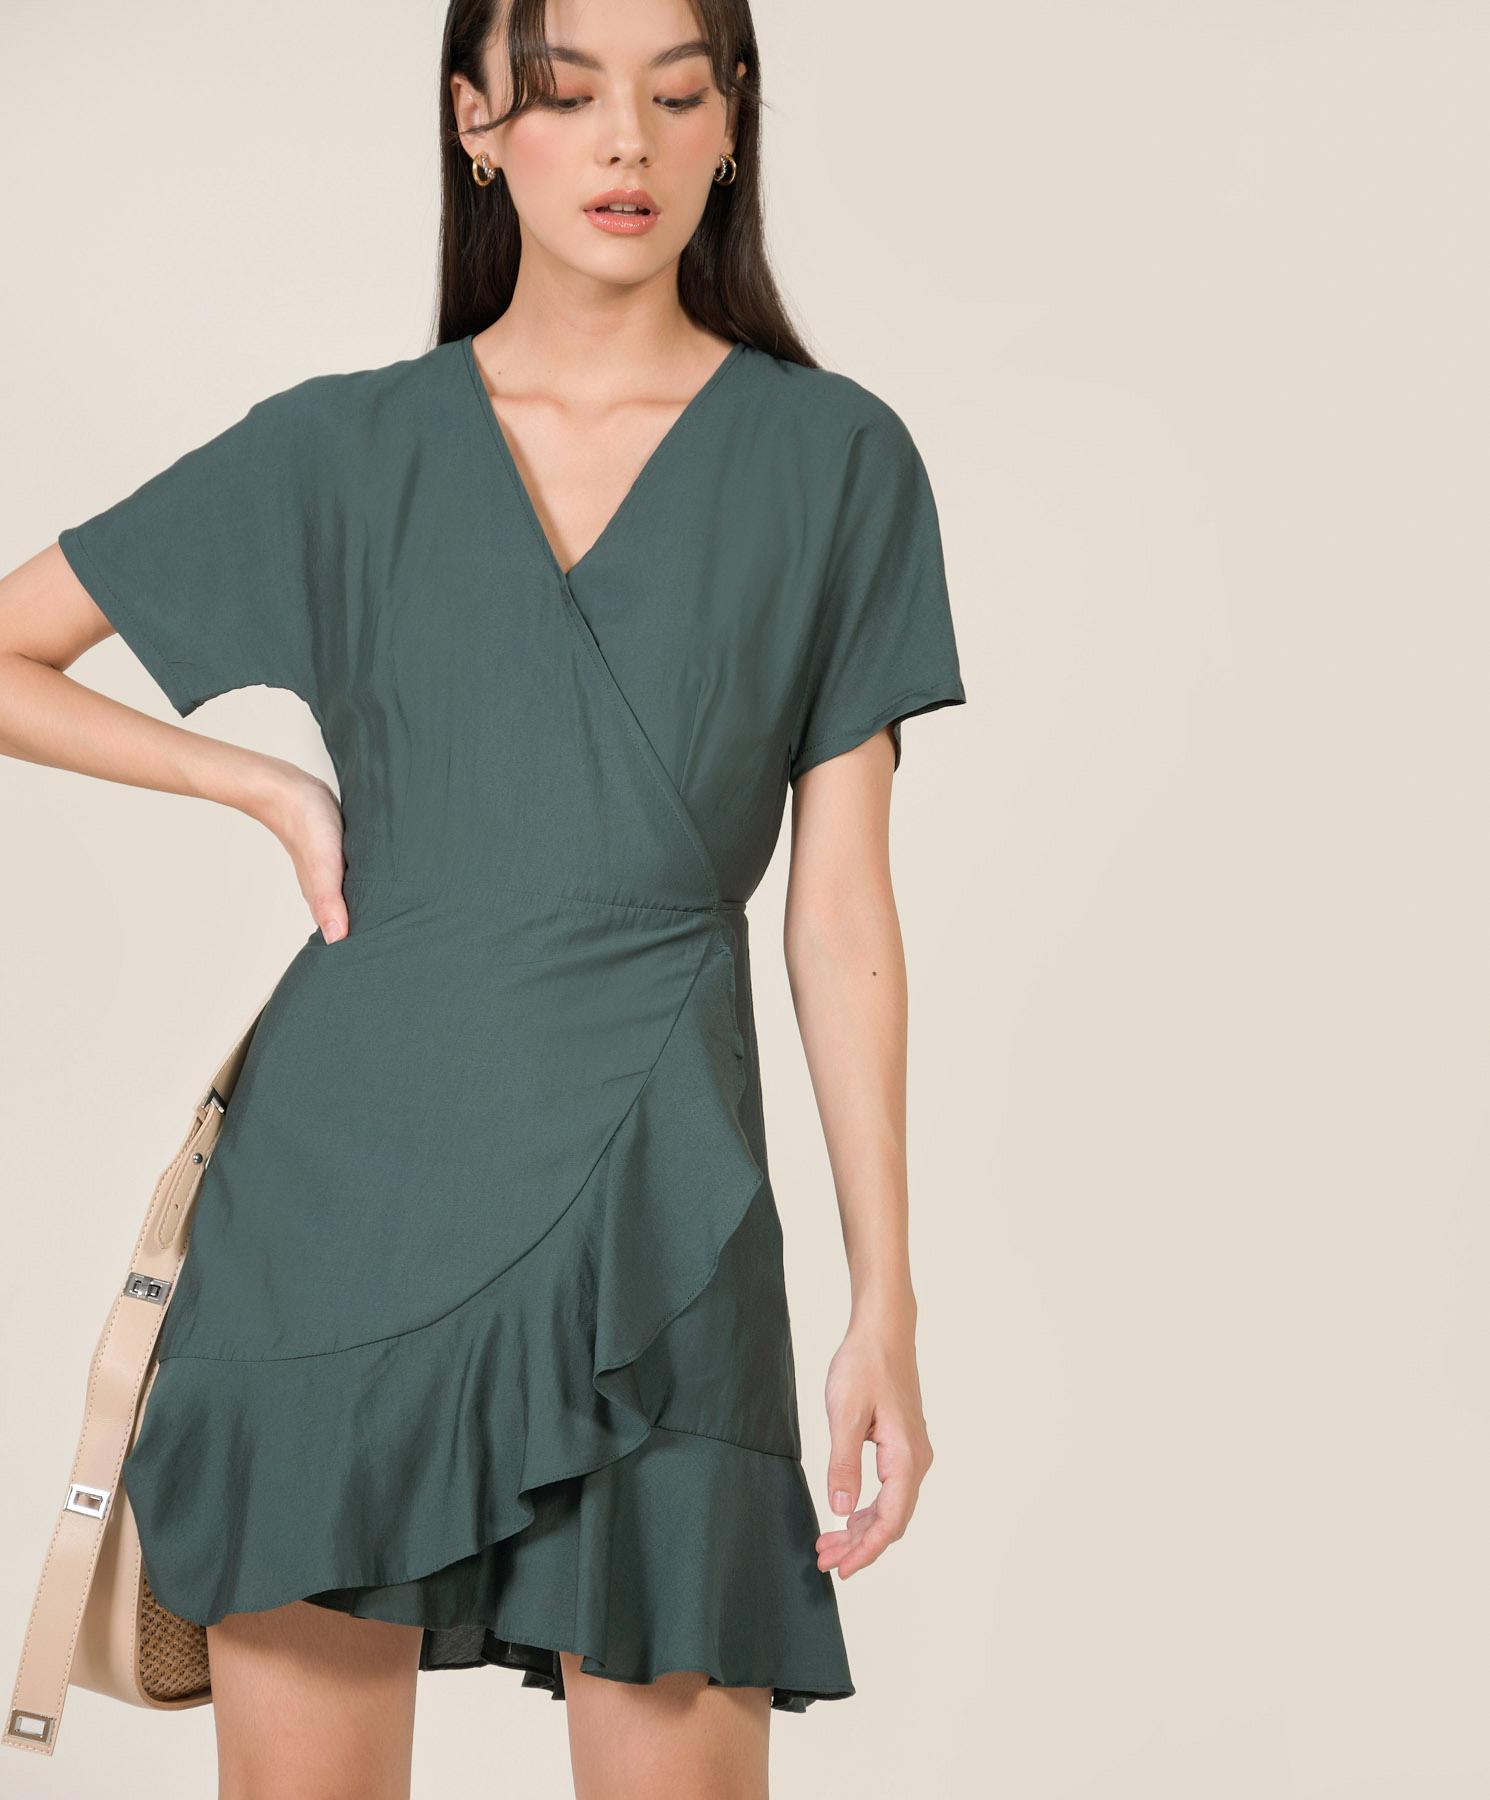 fallon-ruffle-wrap-dress-hunter-green-1